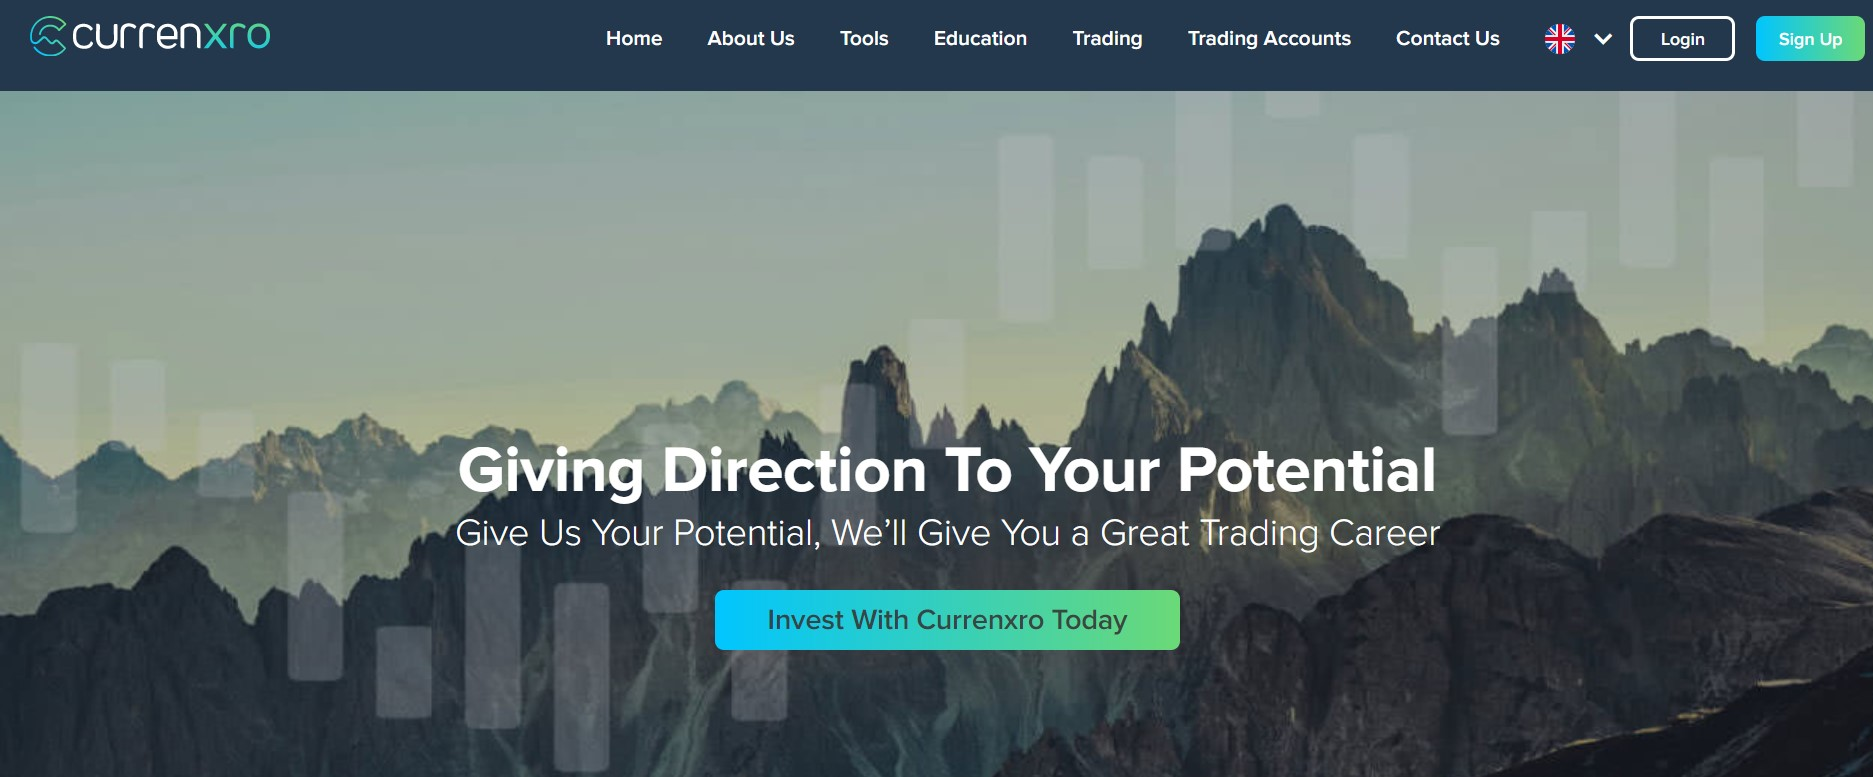 Currenxro website